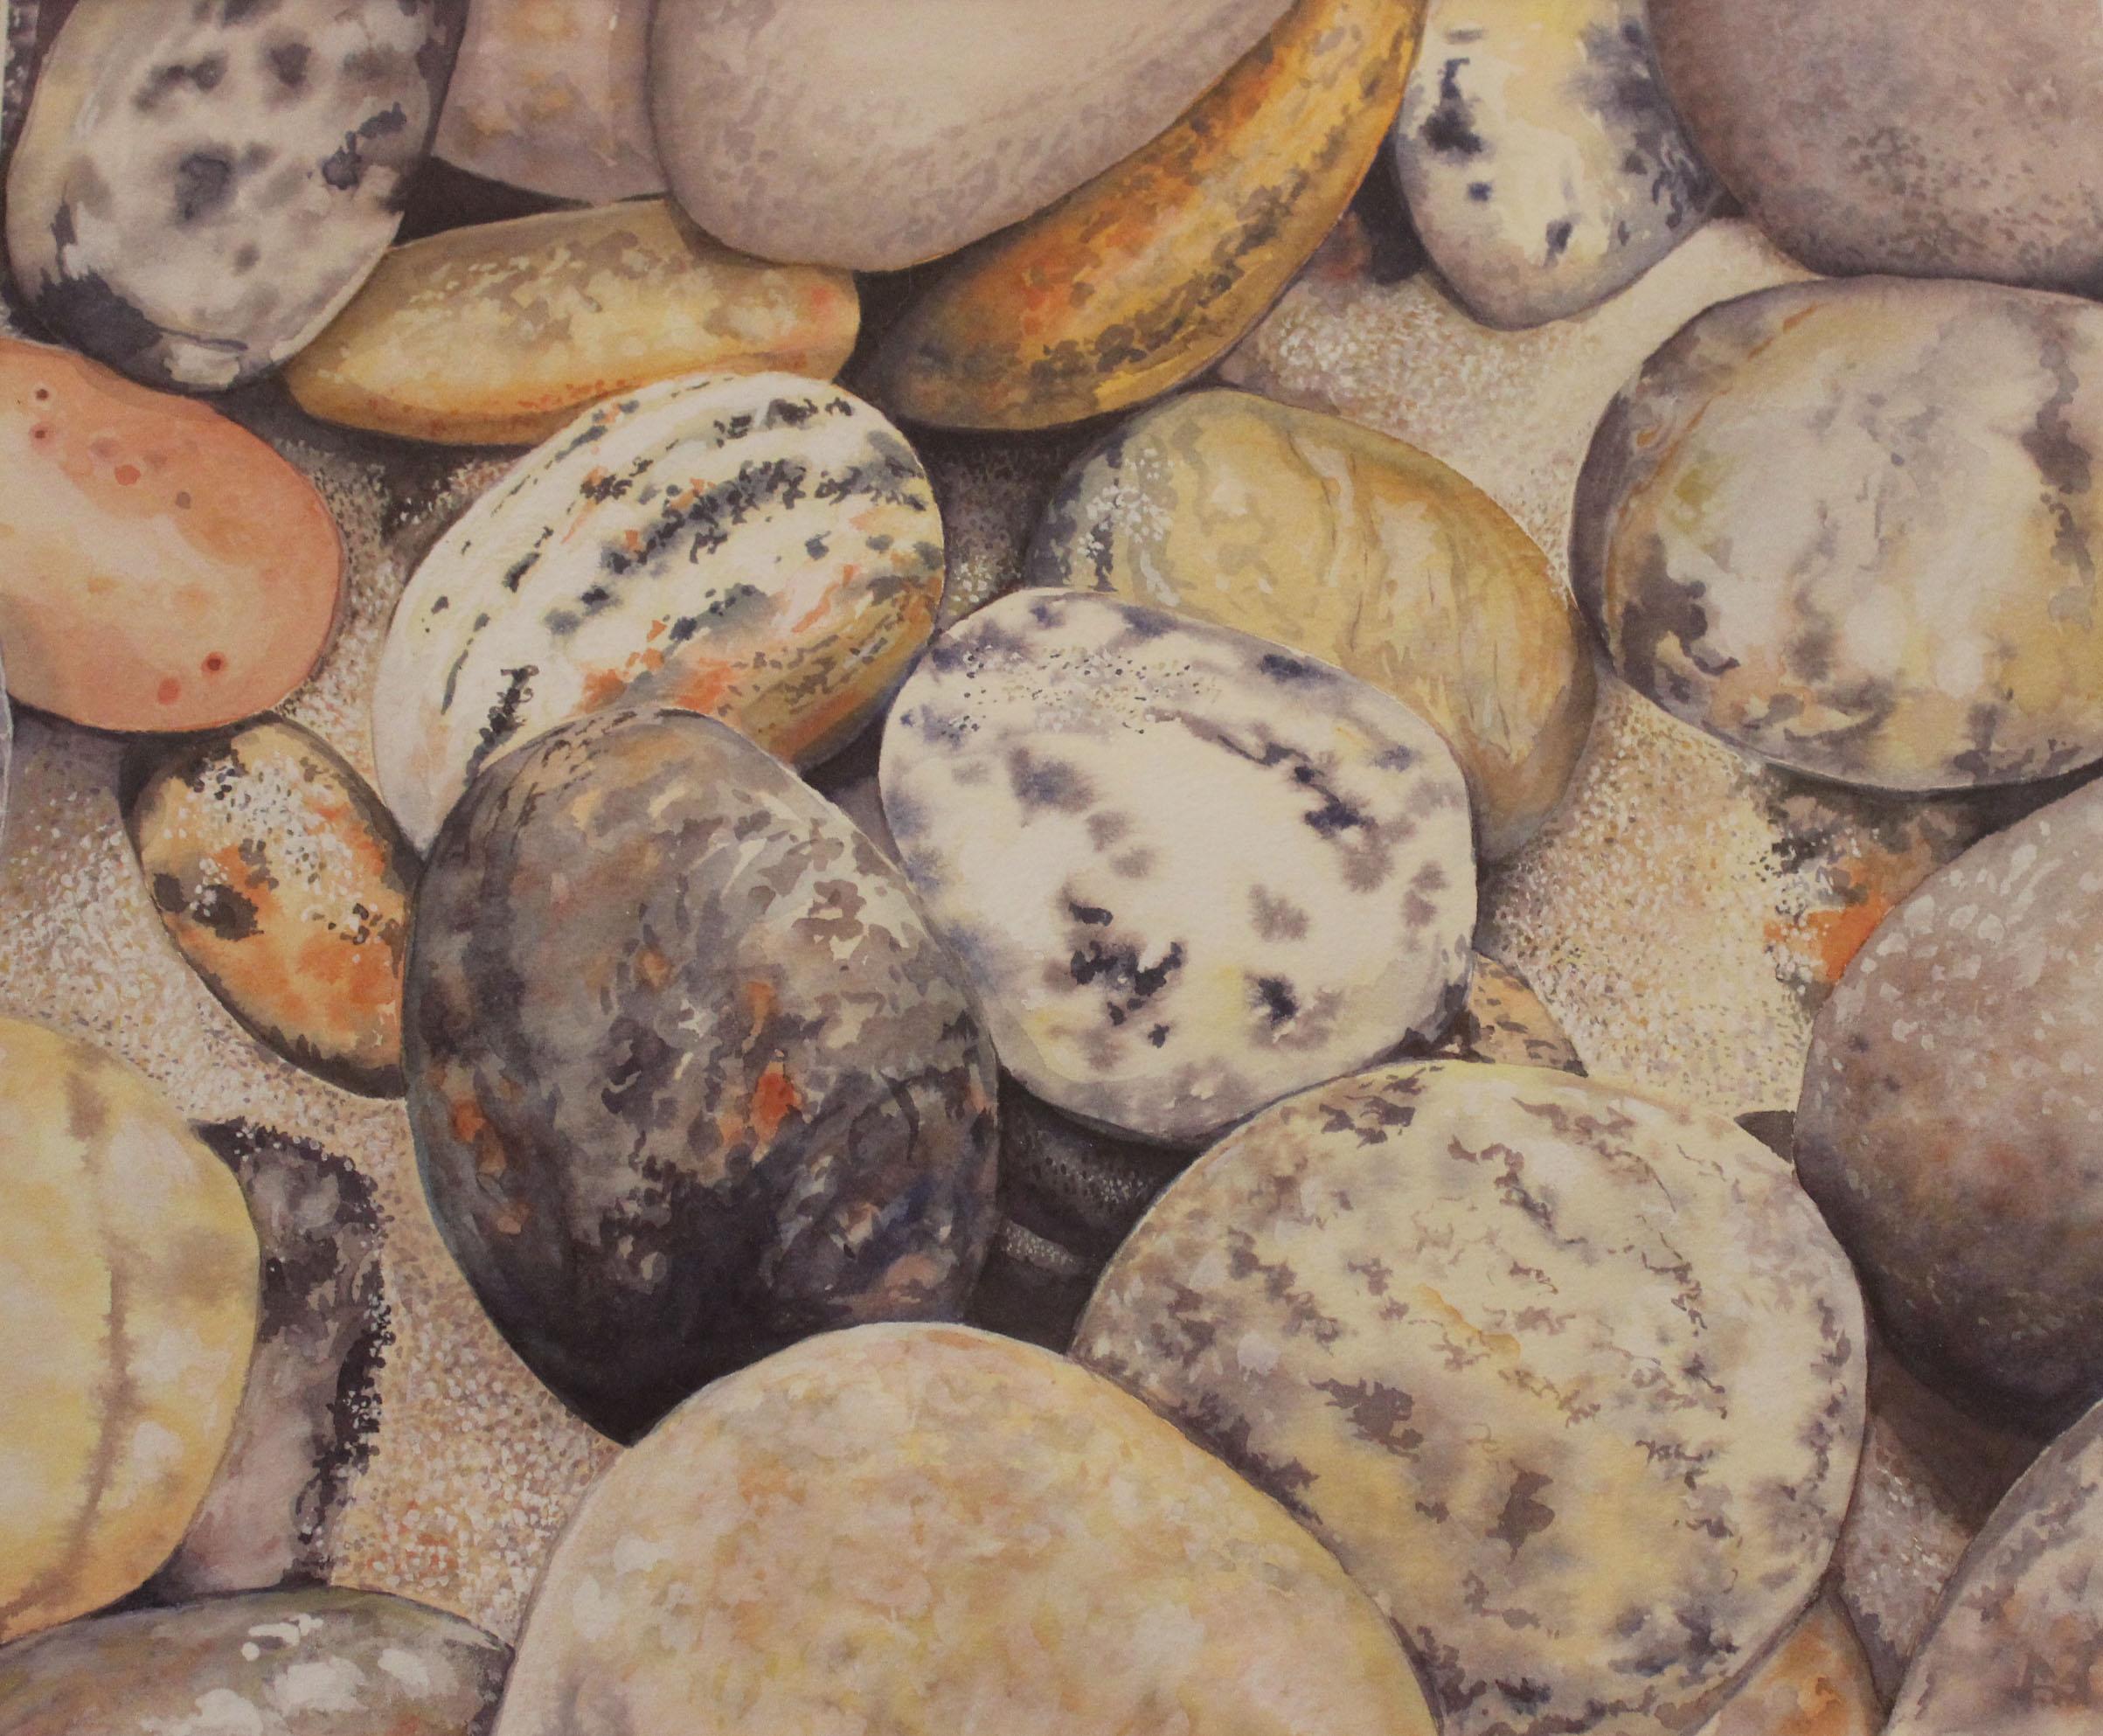 Brenda's Pebbles cropped